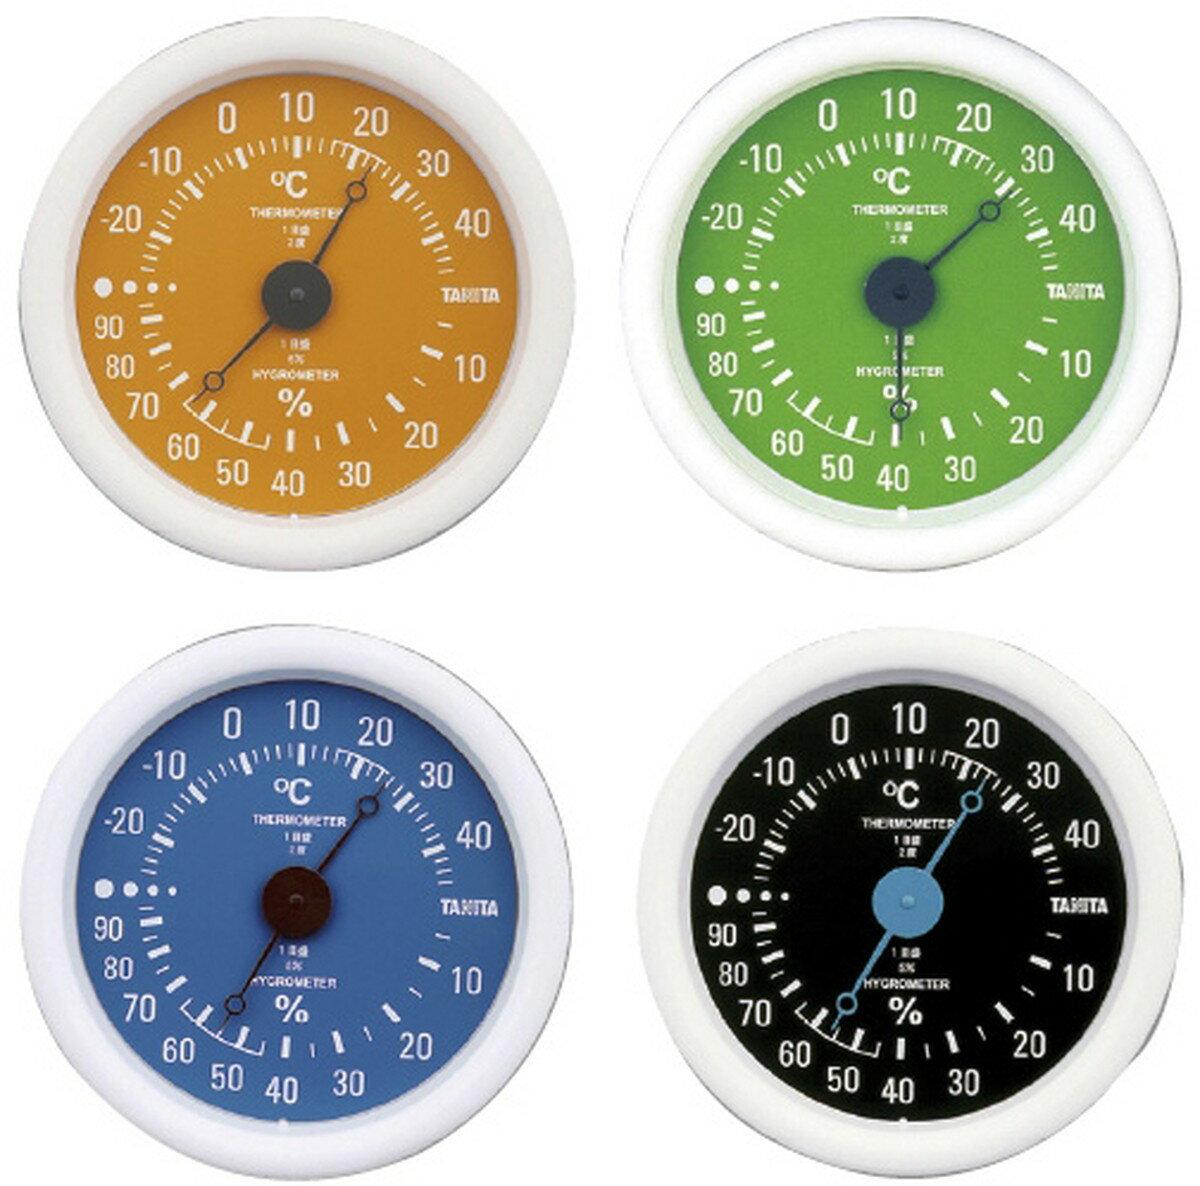 身体測定器・医療計測器, その他 16- TT-515-GR() my20-2307-01-- 1-MYJAN 4904785551510